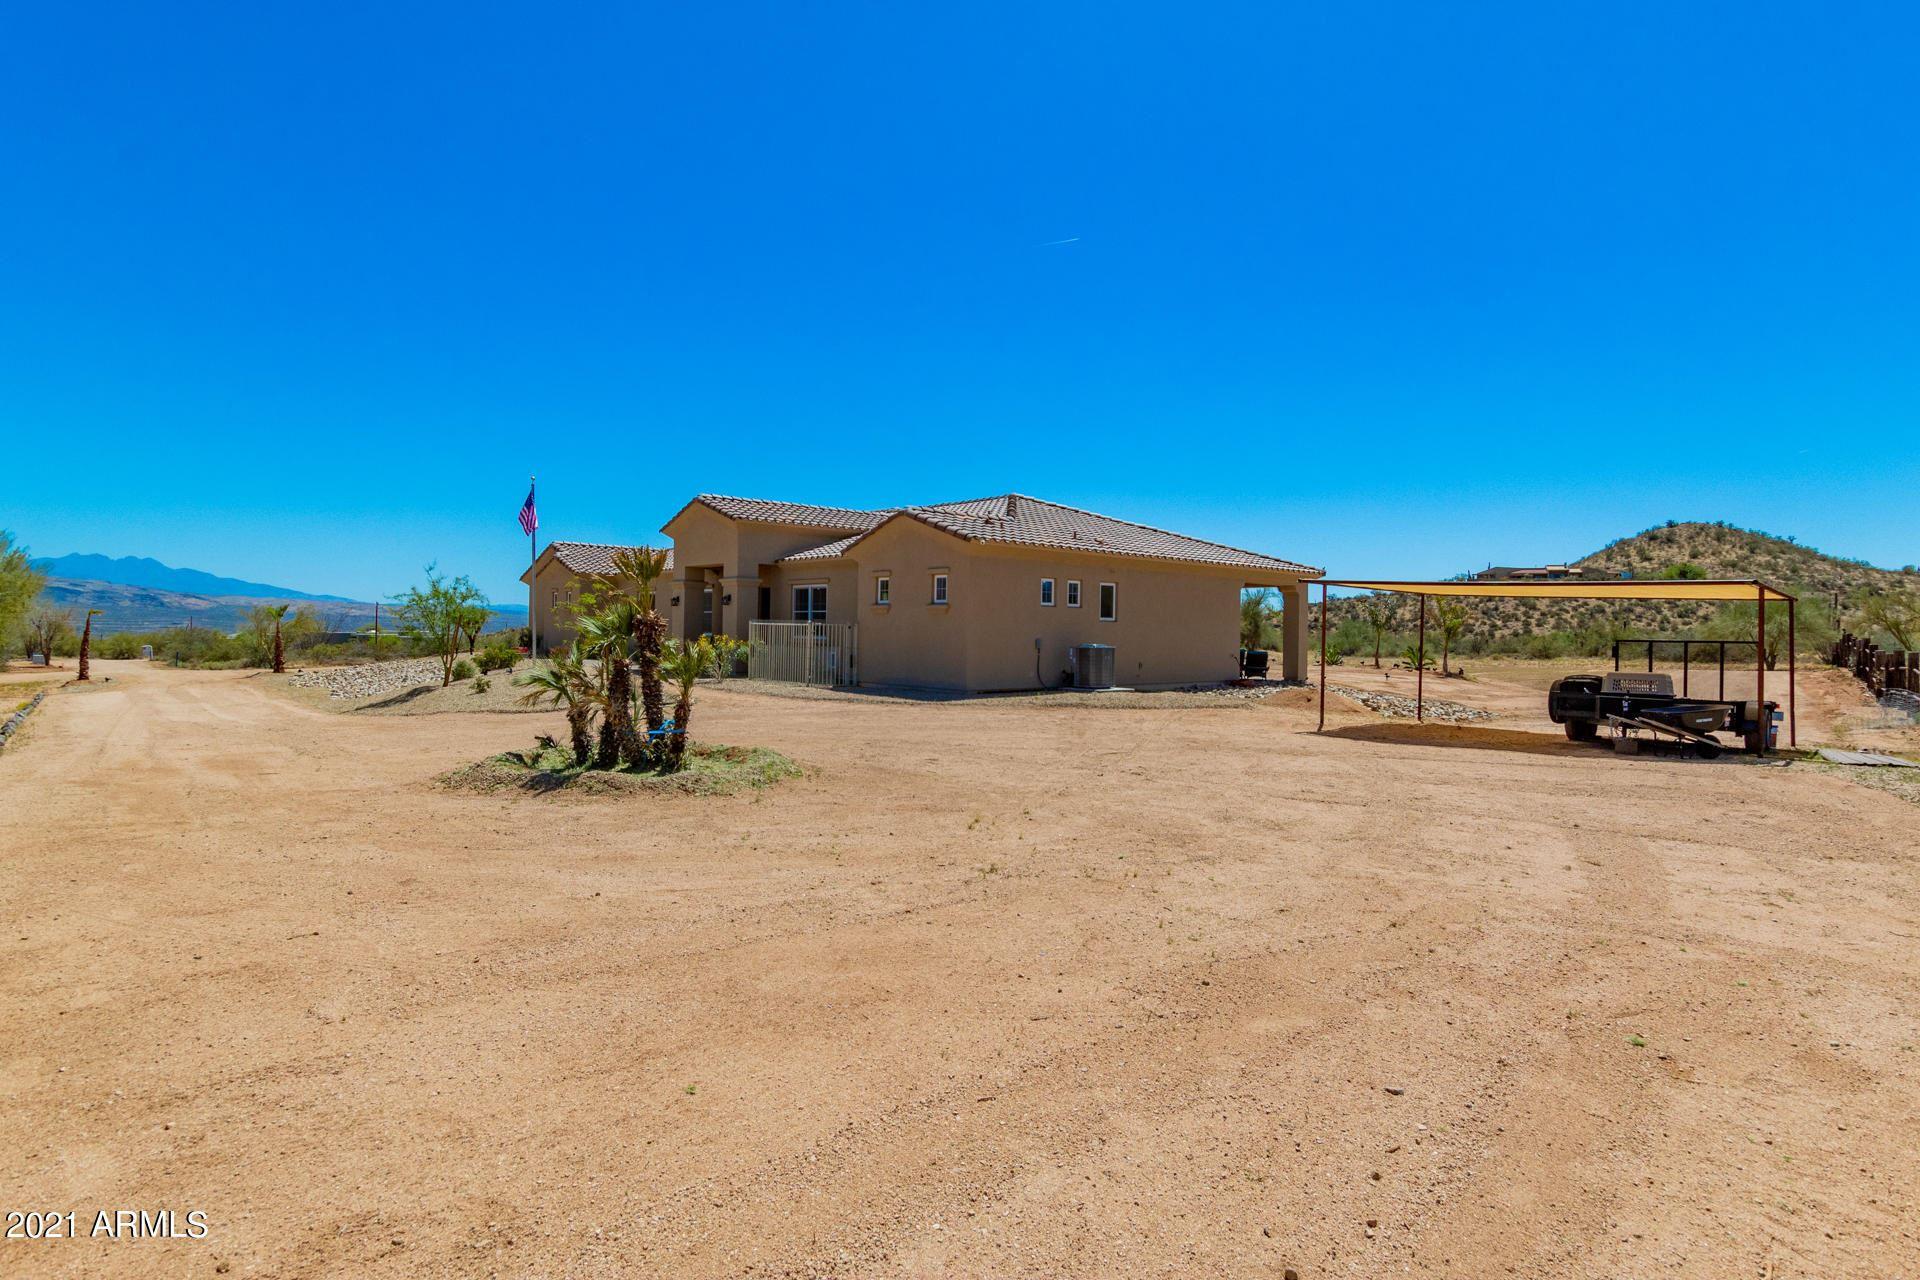 Photo of 17315 E QUAIL TRACK Road, Rio Verde, AZ 85263 (MLS # 6221790)